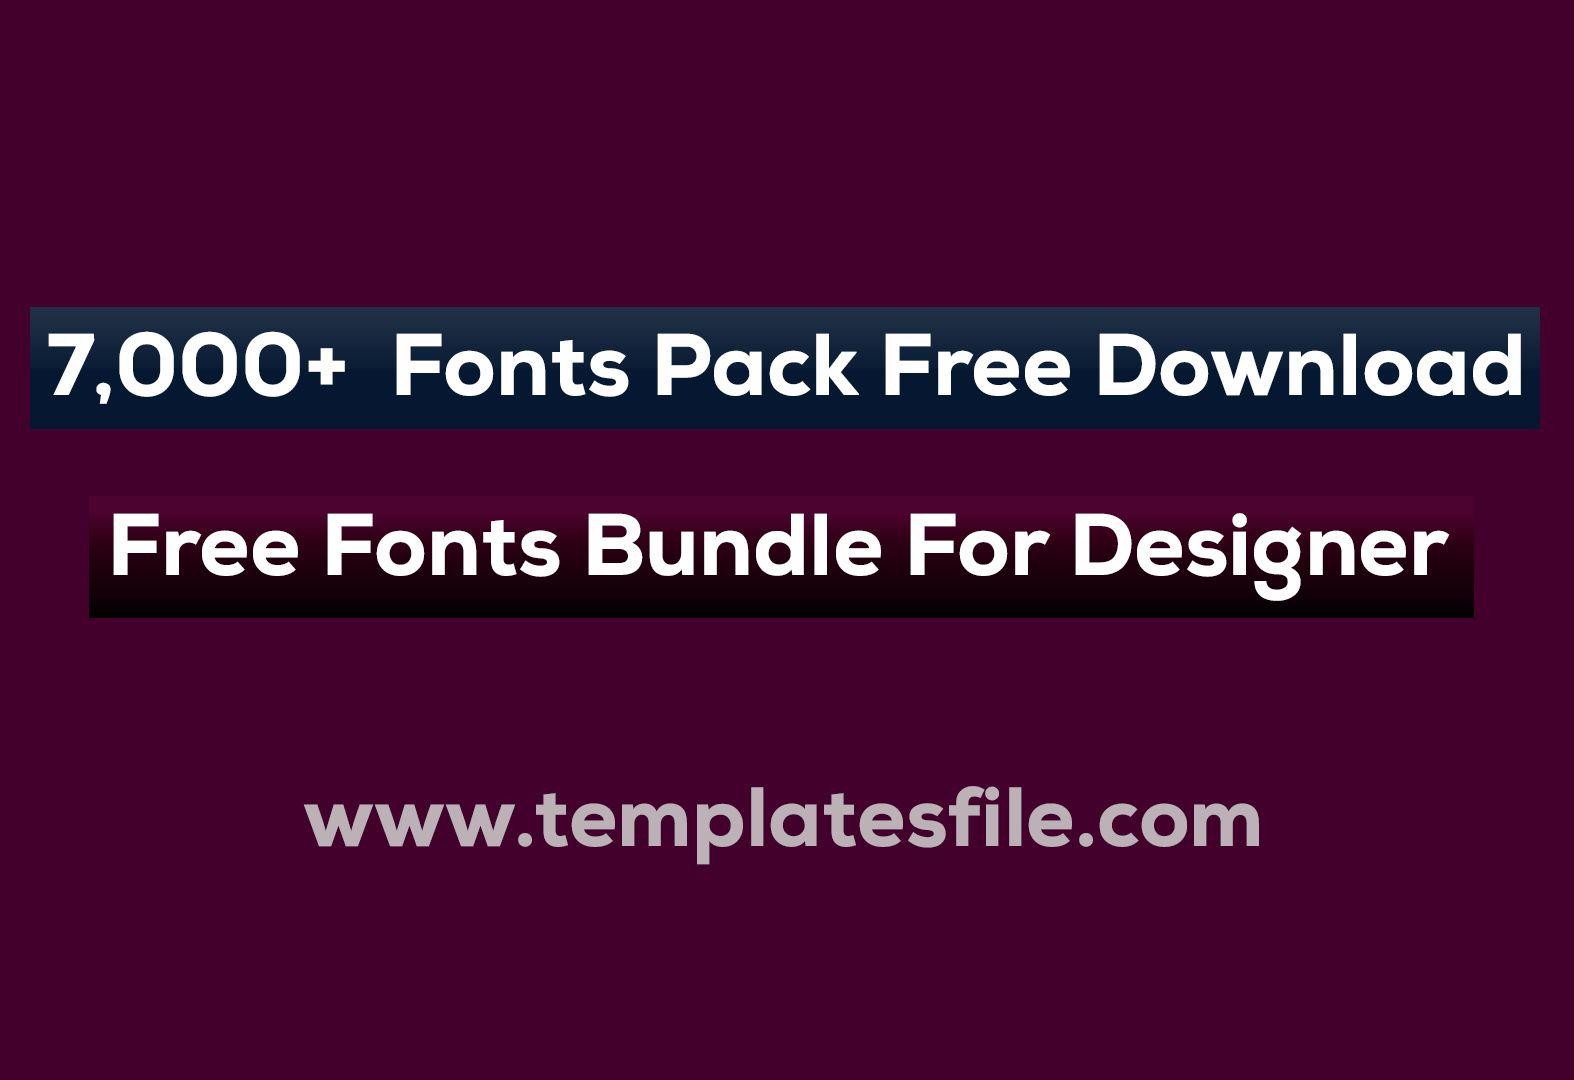 Download 7,000+ Fonts Pack Free Download | Free Fonts Bundle For ...